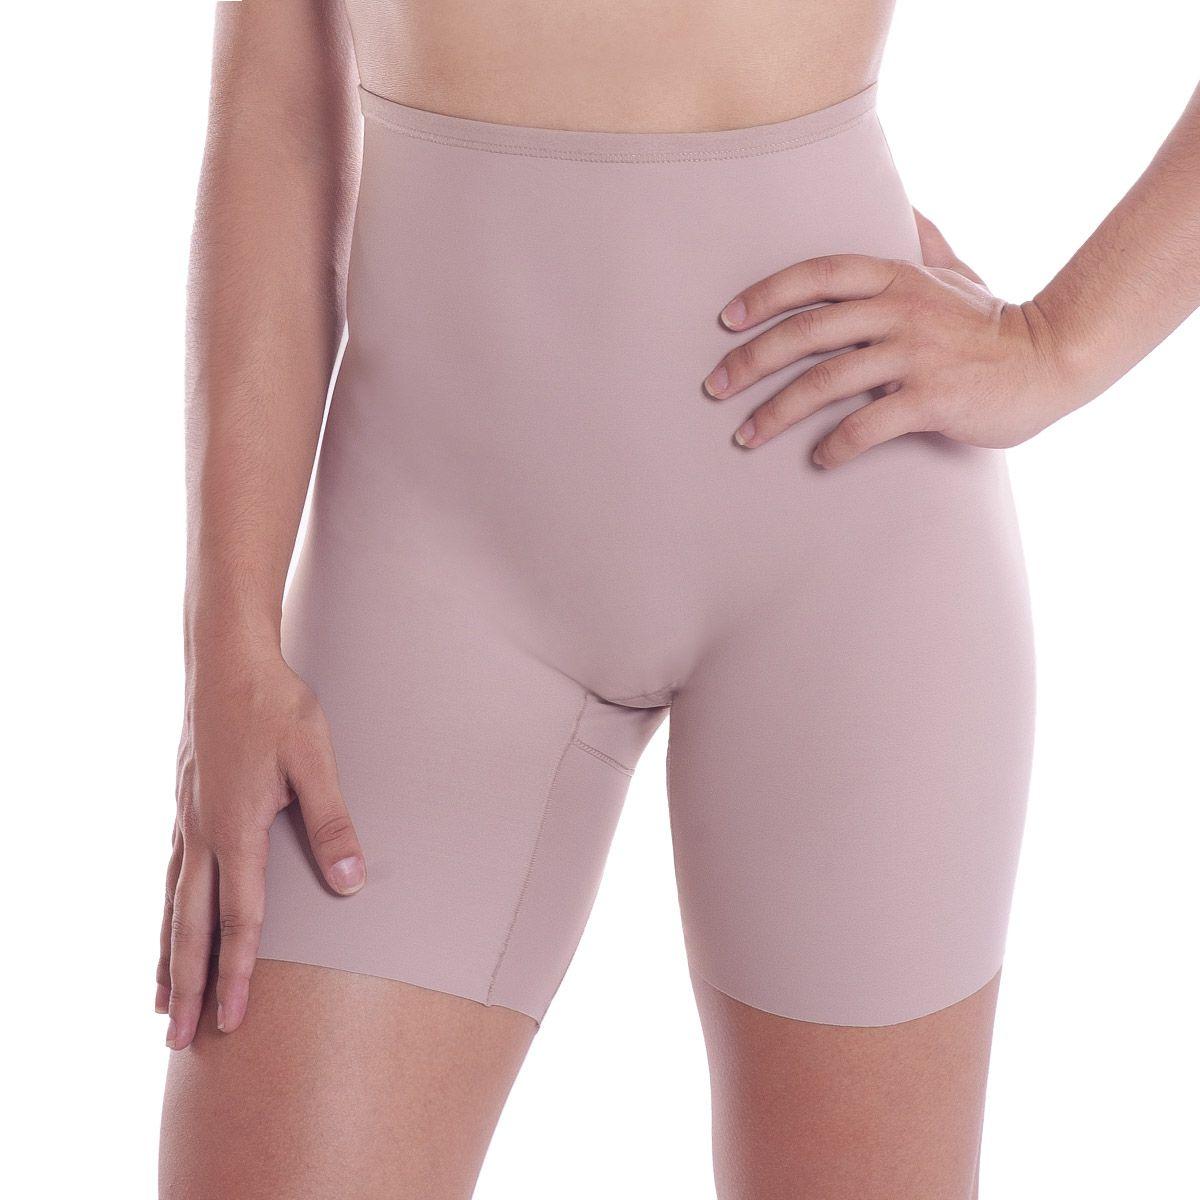 bermuda shorts sem costura para usar sob a roupa kit 2 Liebe